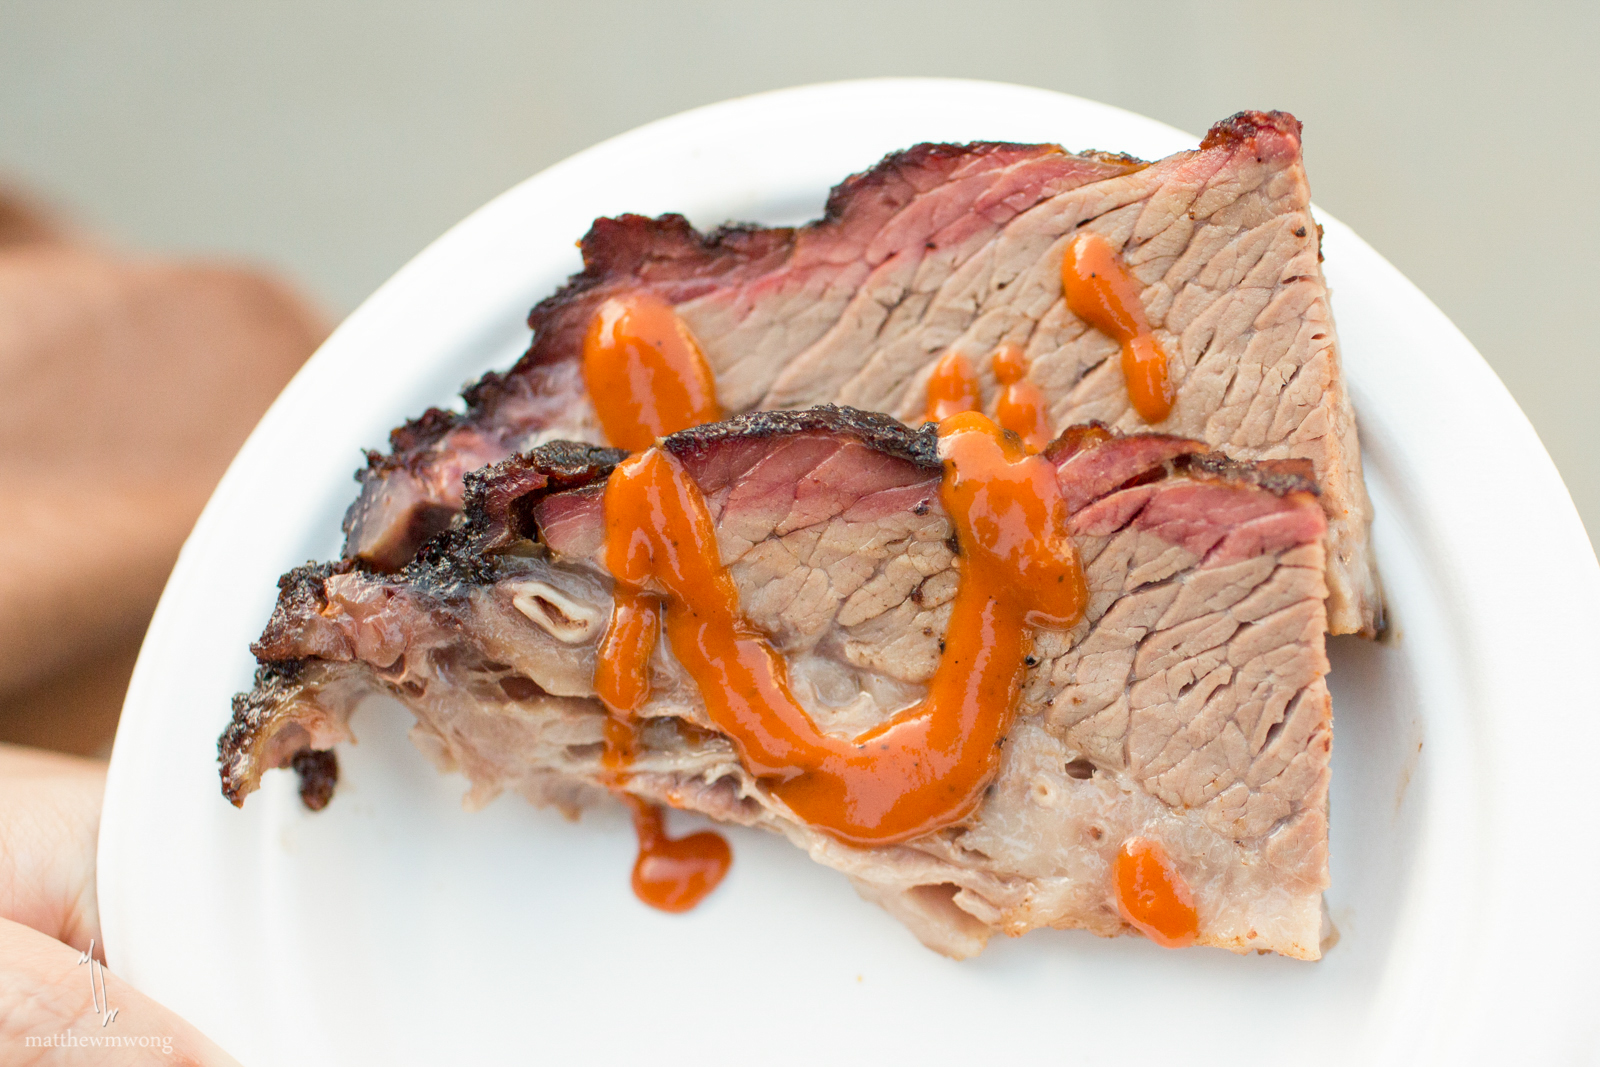 Twin Smokers BBQ beef brisket